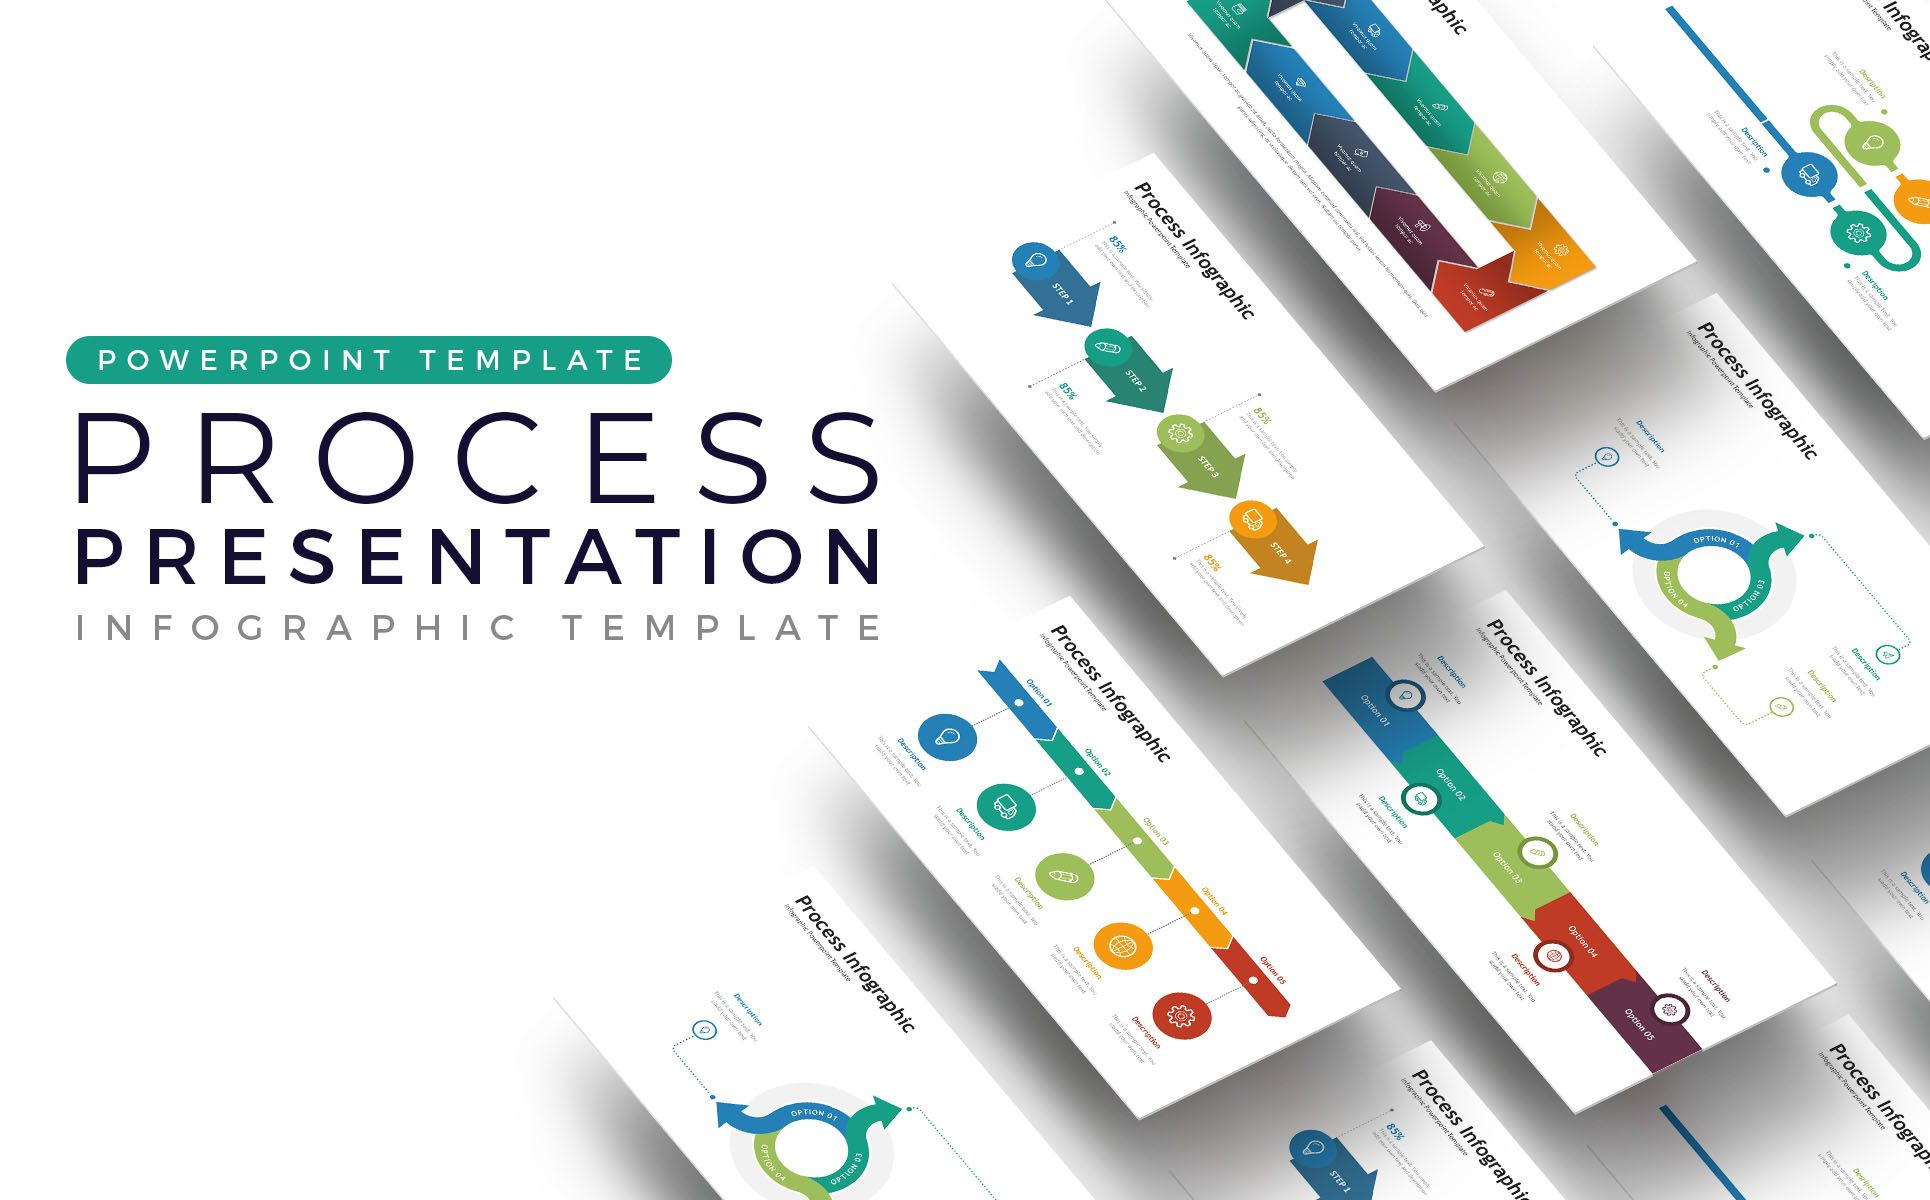 process presentation infographic powerpoint template design